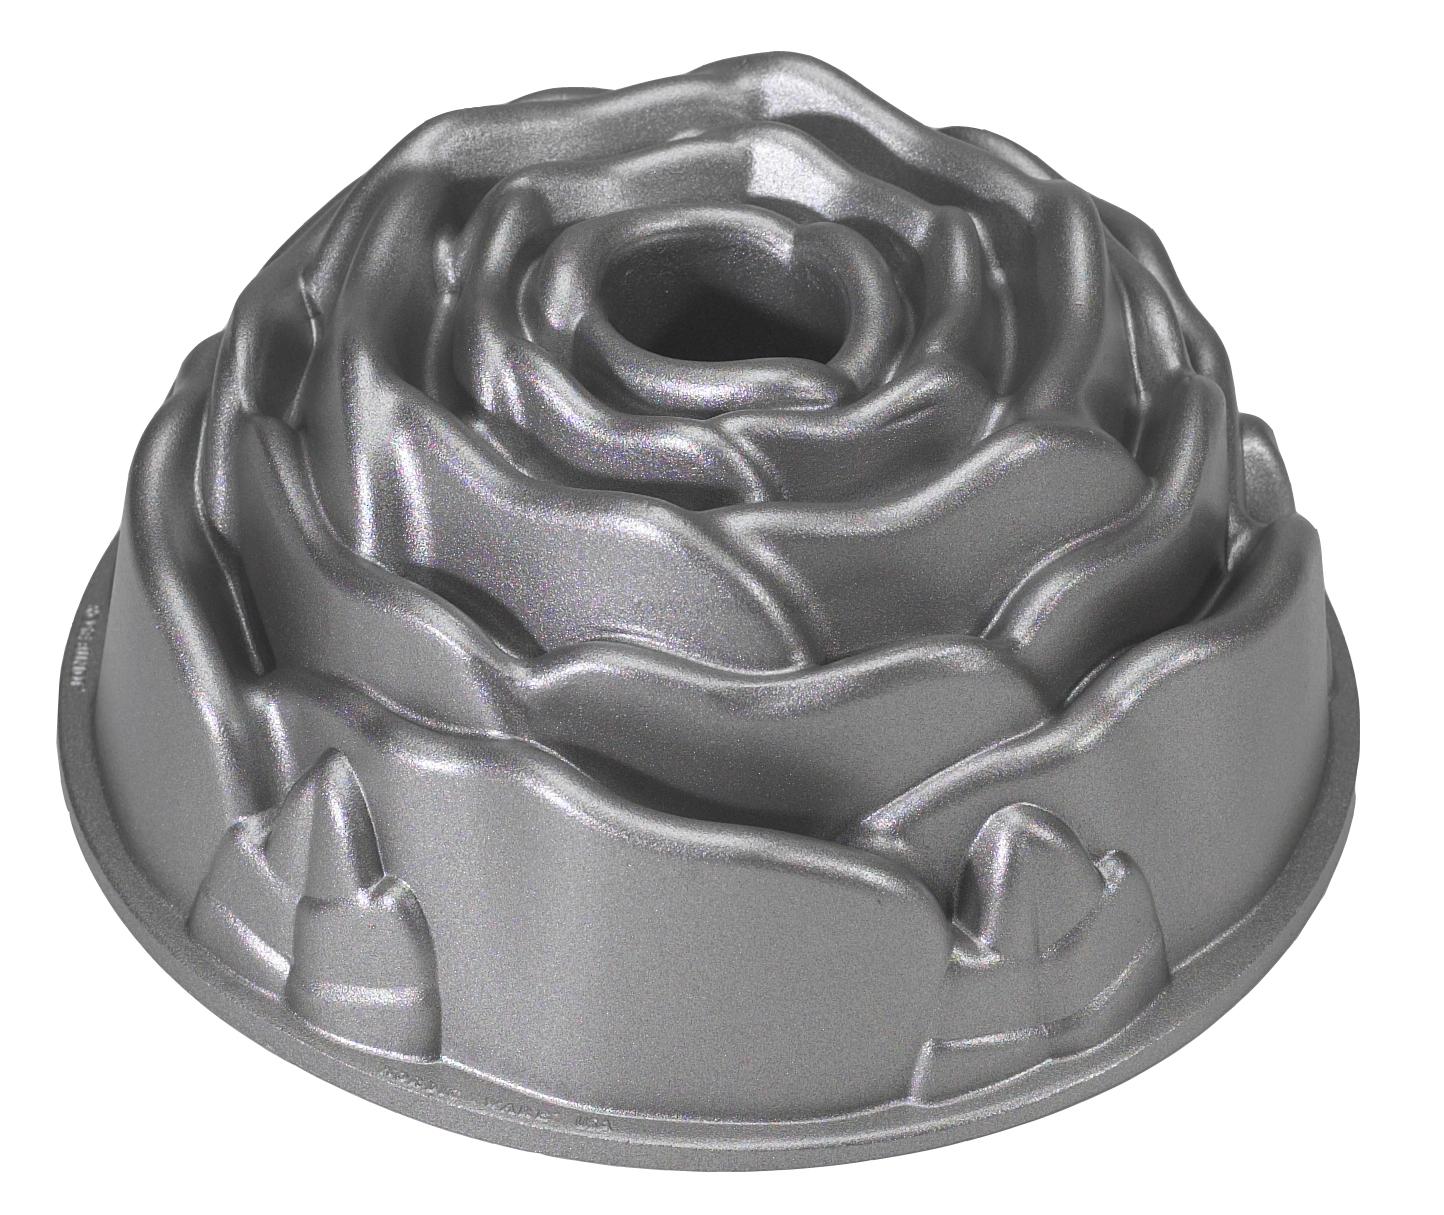 Nordic Ware Kakform Rose Bundt